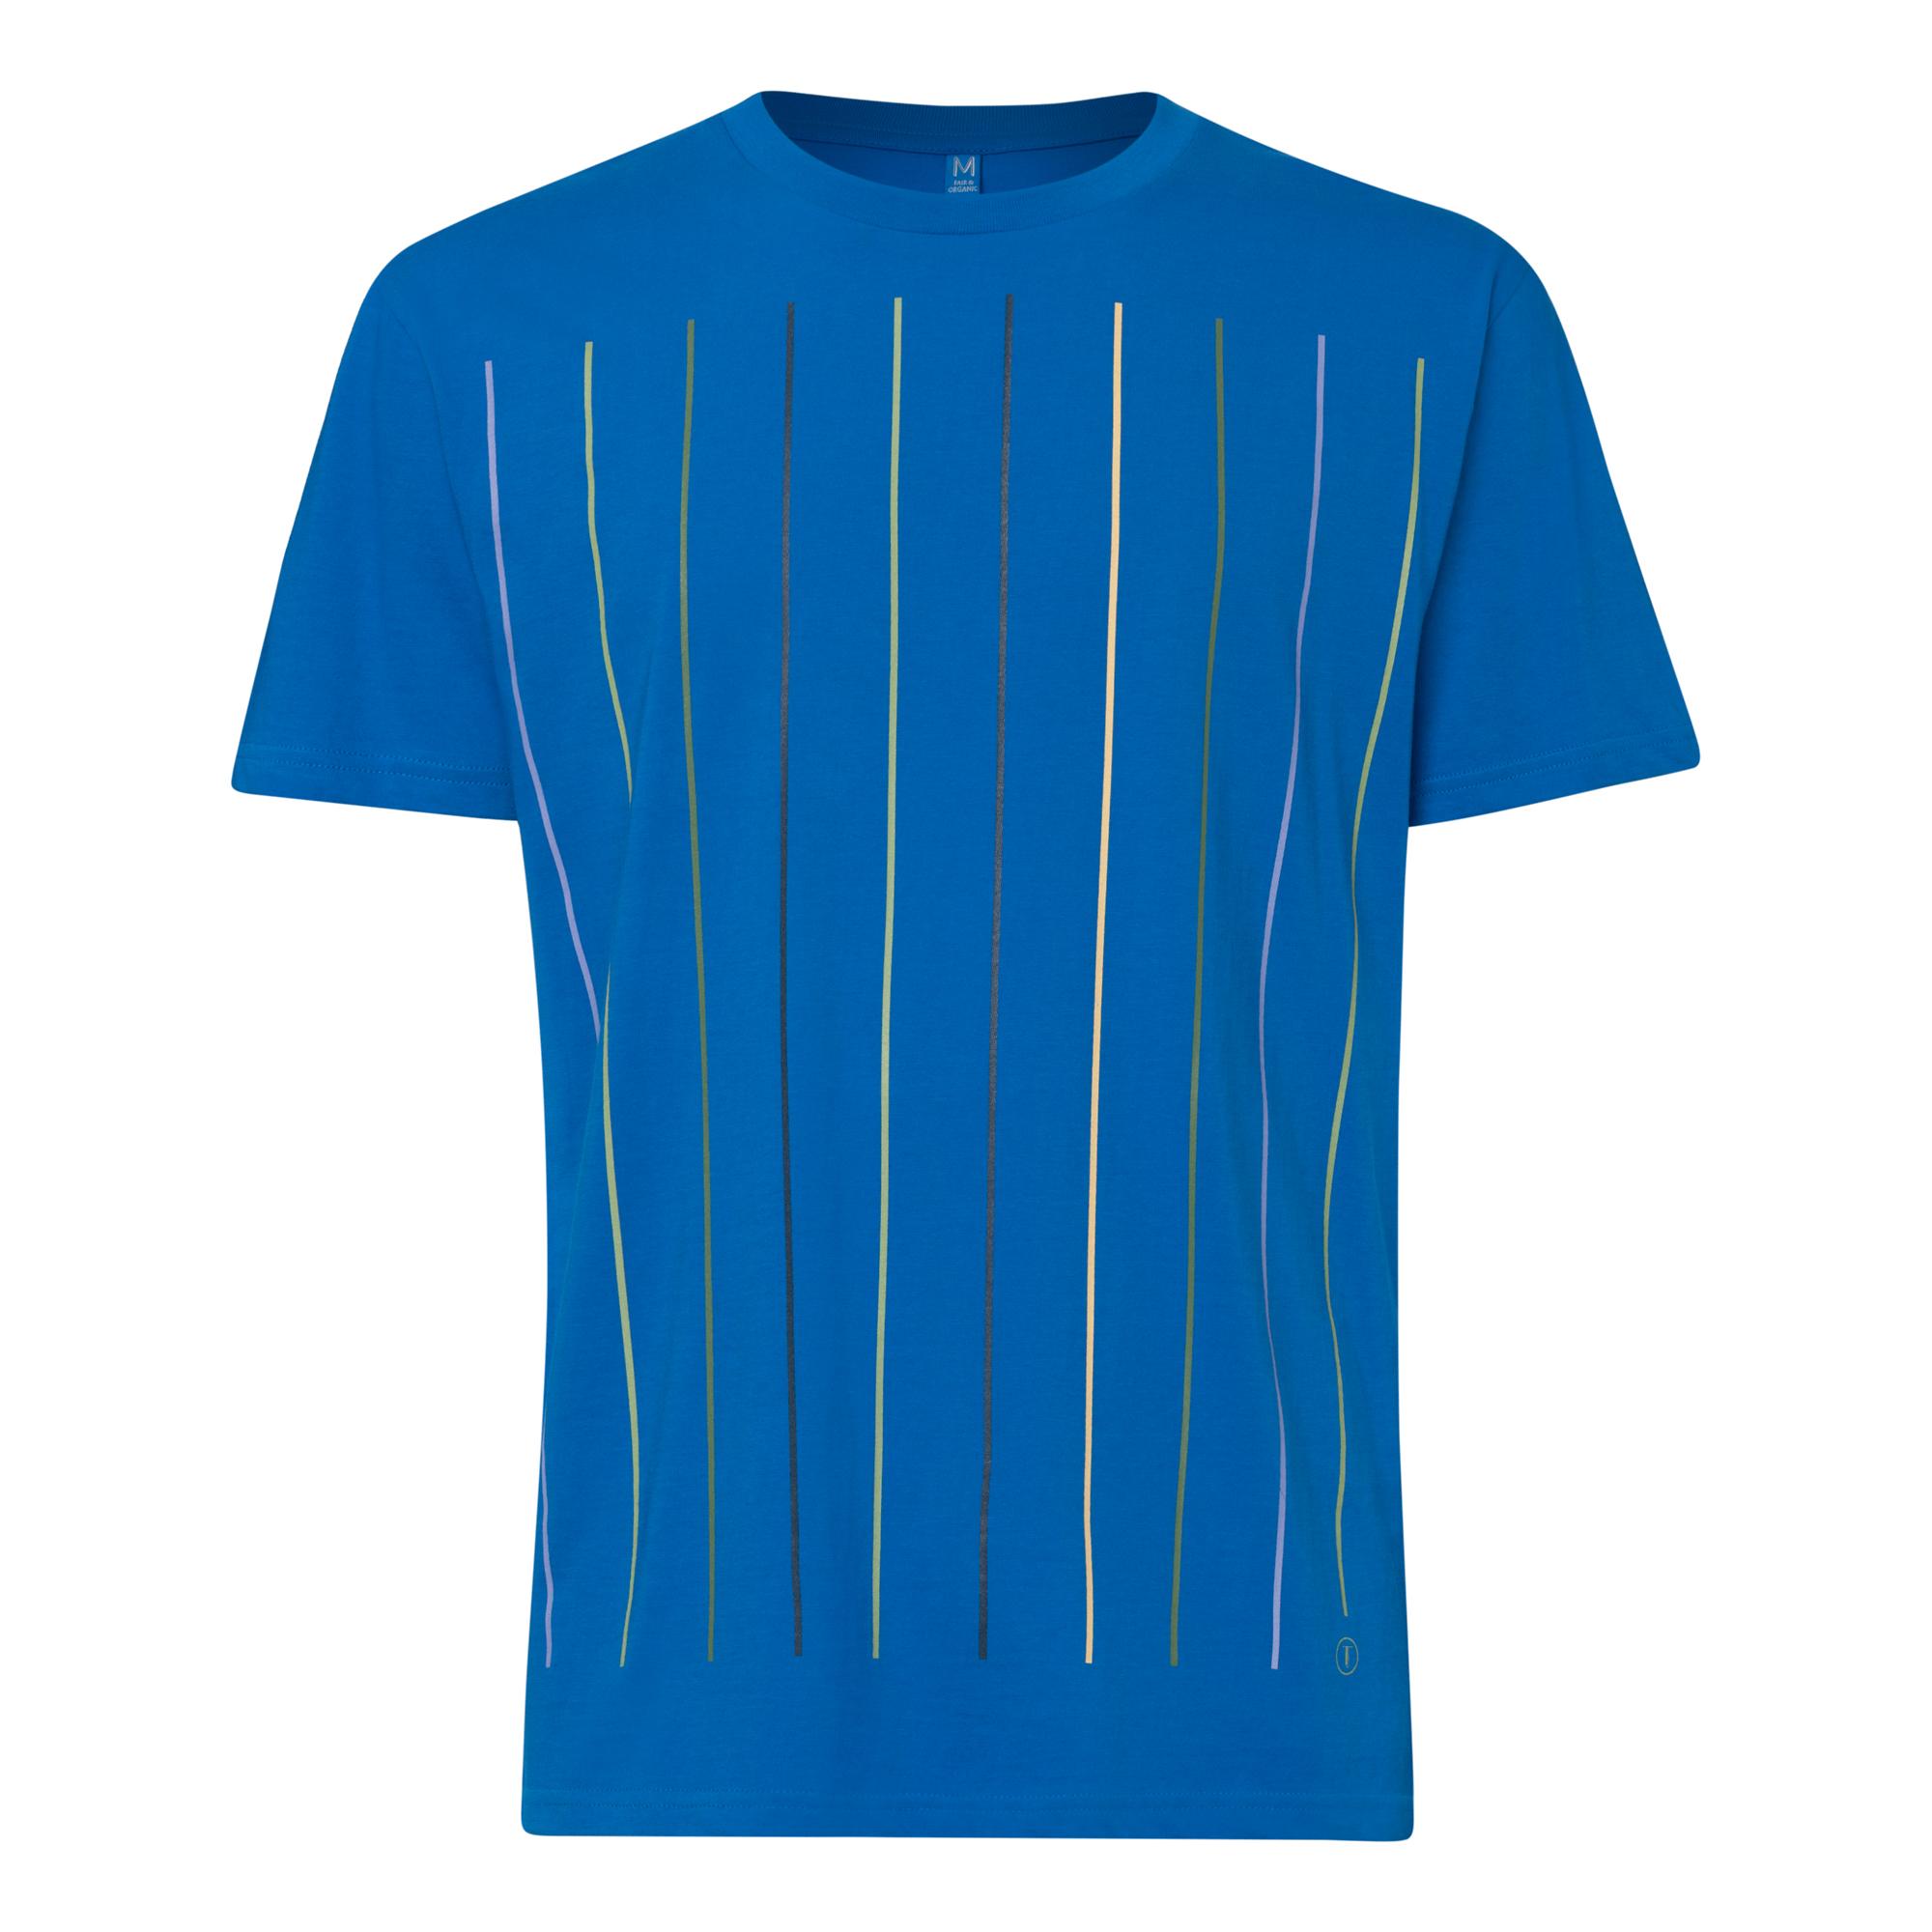 Wall T-Shirt french blue GOTS & Fairtrade